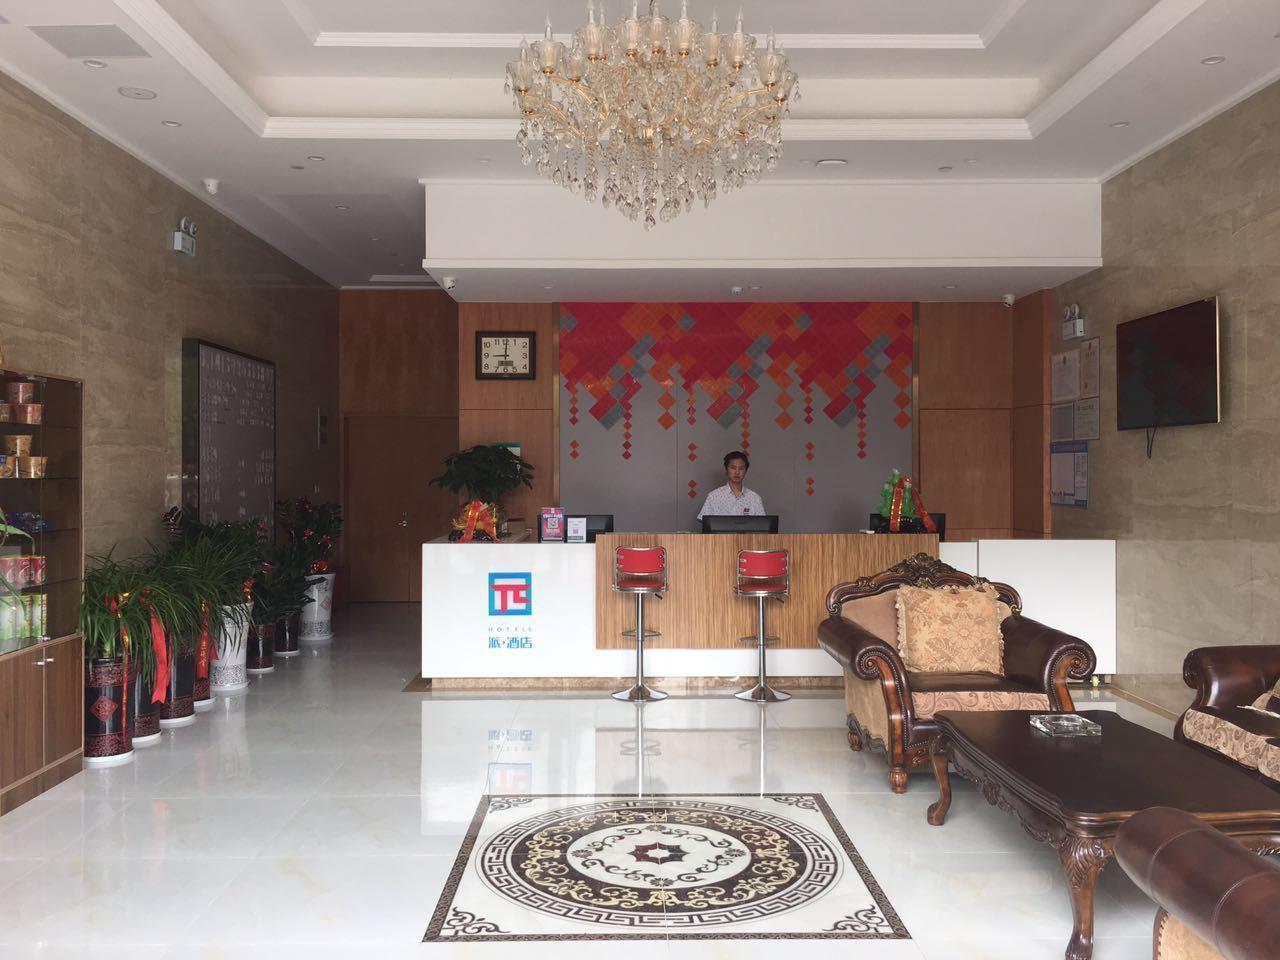 Pai Hotel Nanjing West Shengtai Road Subway Station Reviews